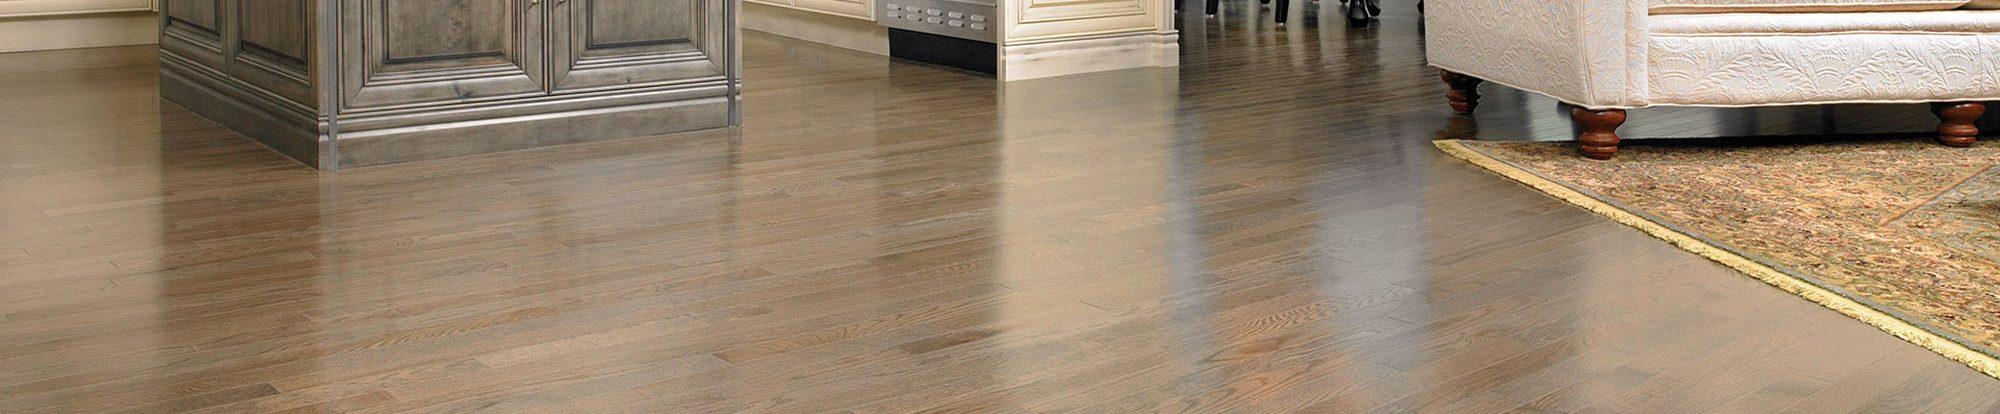 Hardwood flooring york pa gurus floor for Hardwood floors york pa